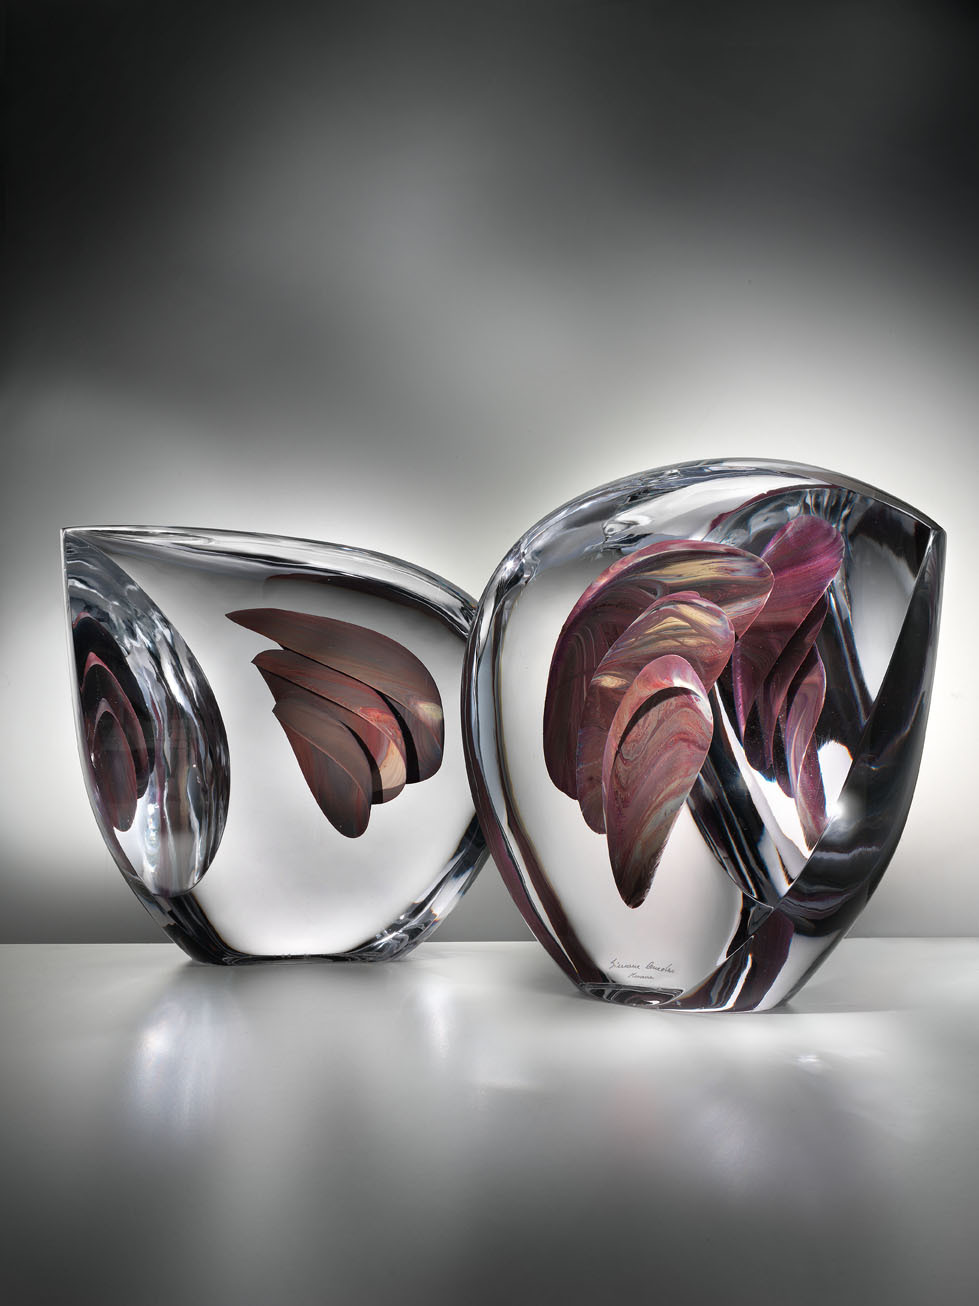 simone-cenedese-artigiani-del-vetro-venezia-thumbnail